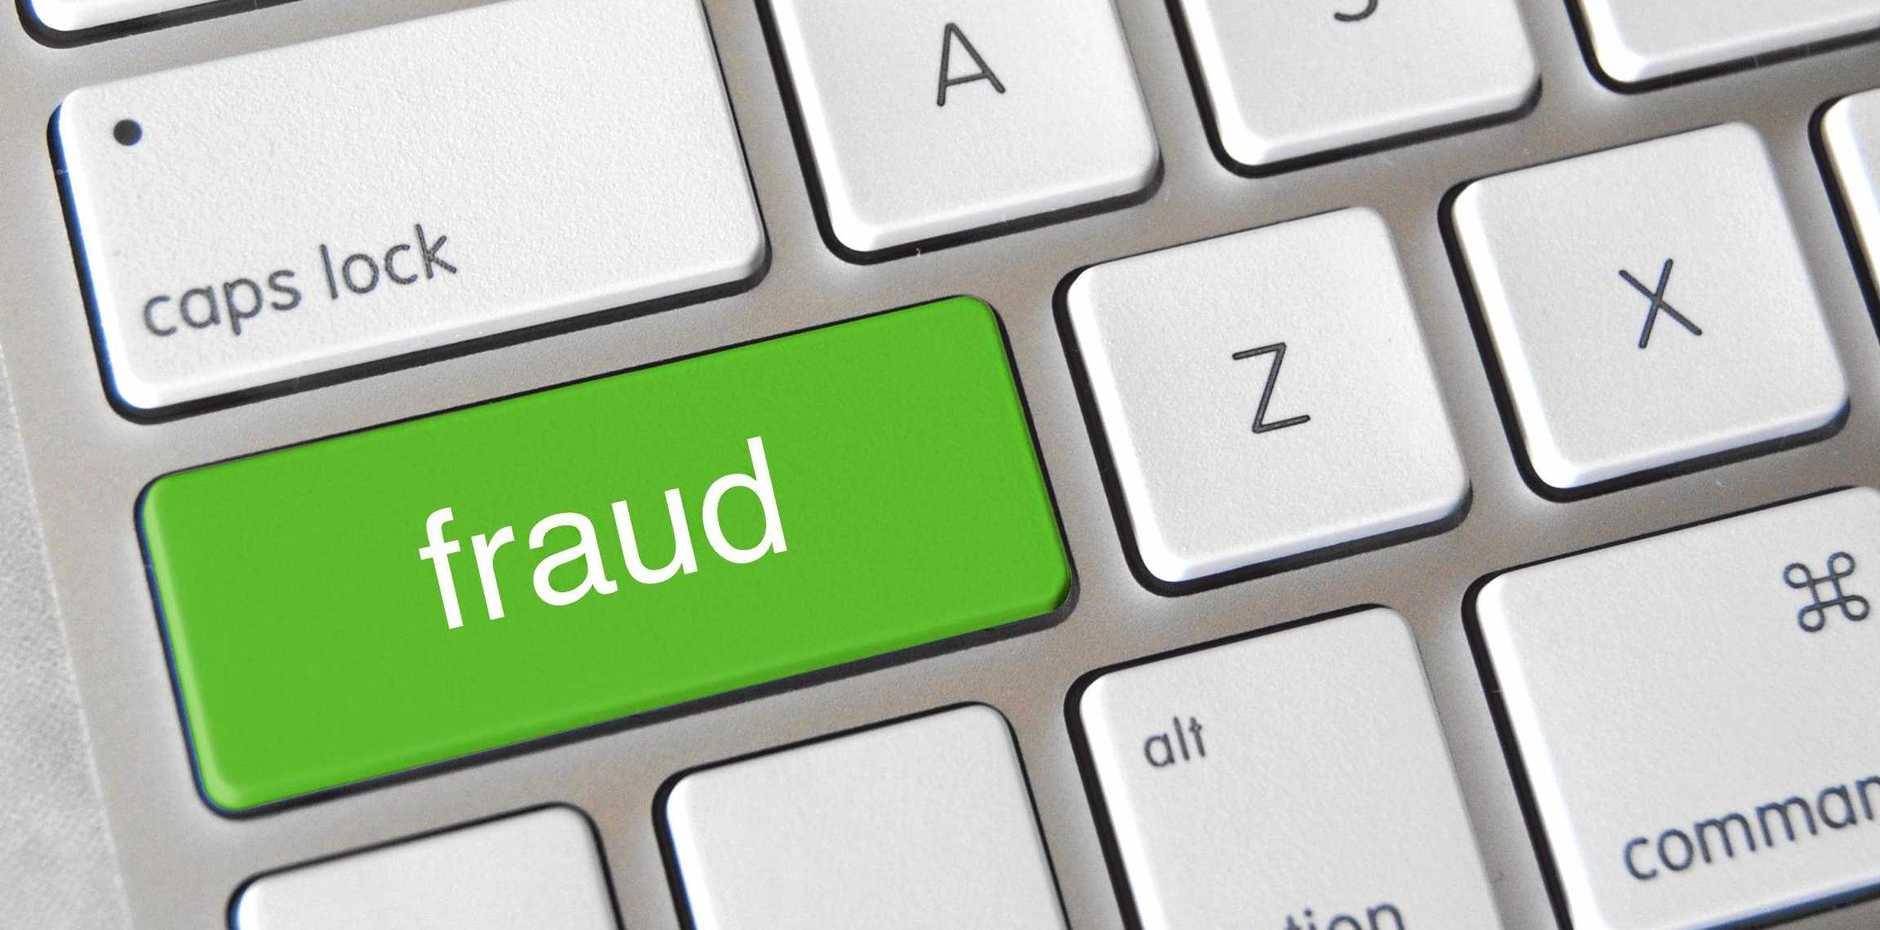 Louise Karen Jarrett is accused of stealing $66,000 from bank accounts belonging to three people.